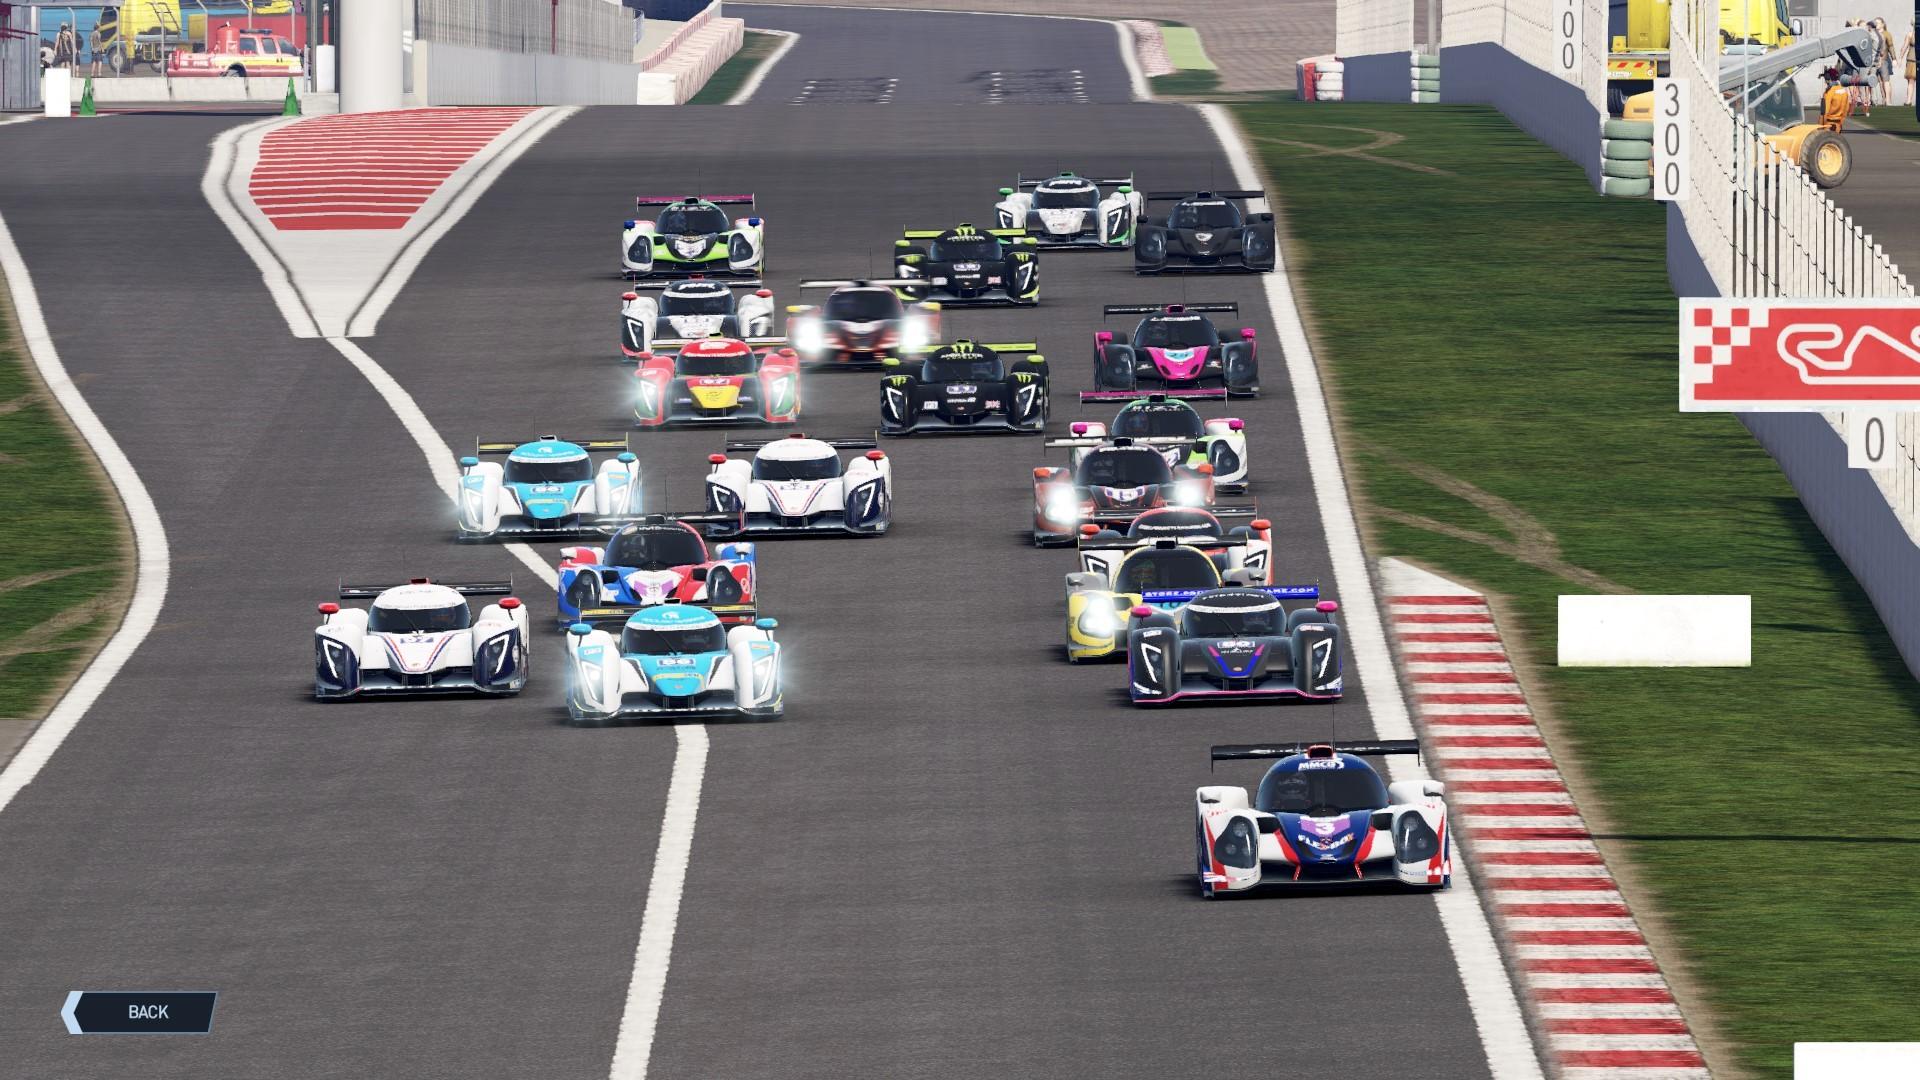 Project Cars 2 – LMP3 Bajnokság